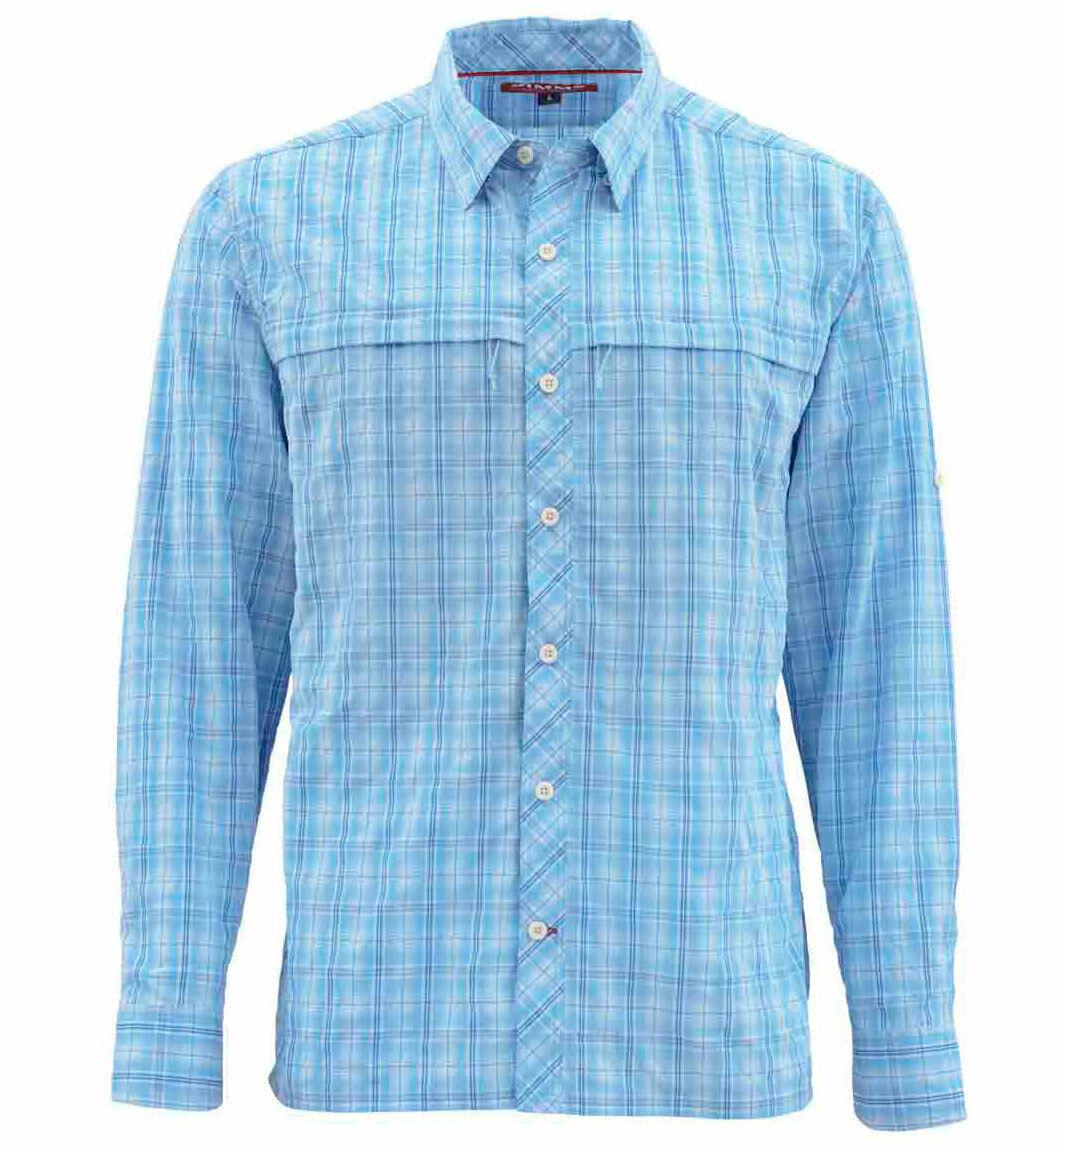 Simms Stone Cold LS Shirt  Indigo Plaid  XL  gratuito US Shipping